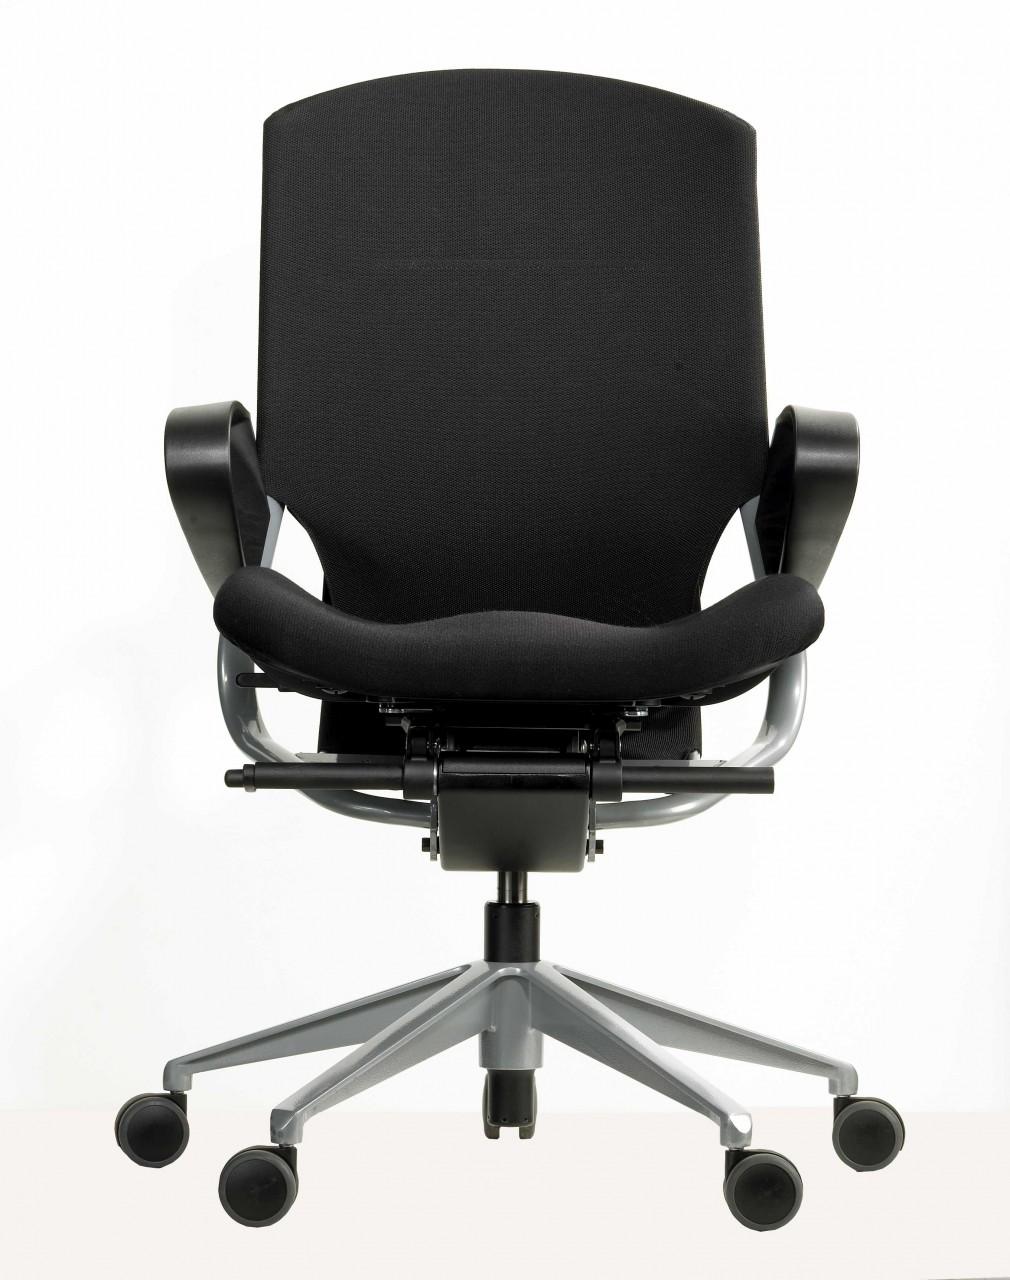 fauteuil de bureau ergonomique ergotango. Black Bedroom Furniture Sets. Home Design Ideas